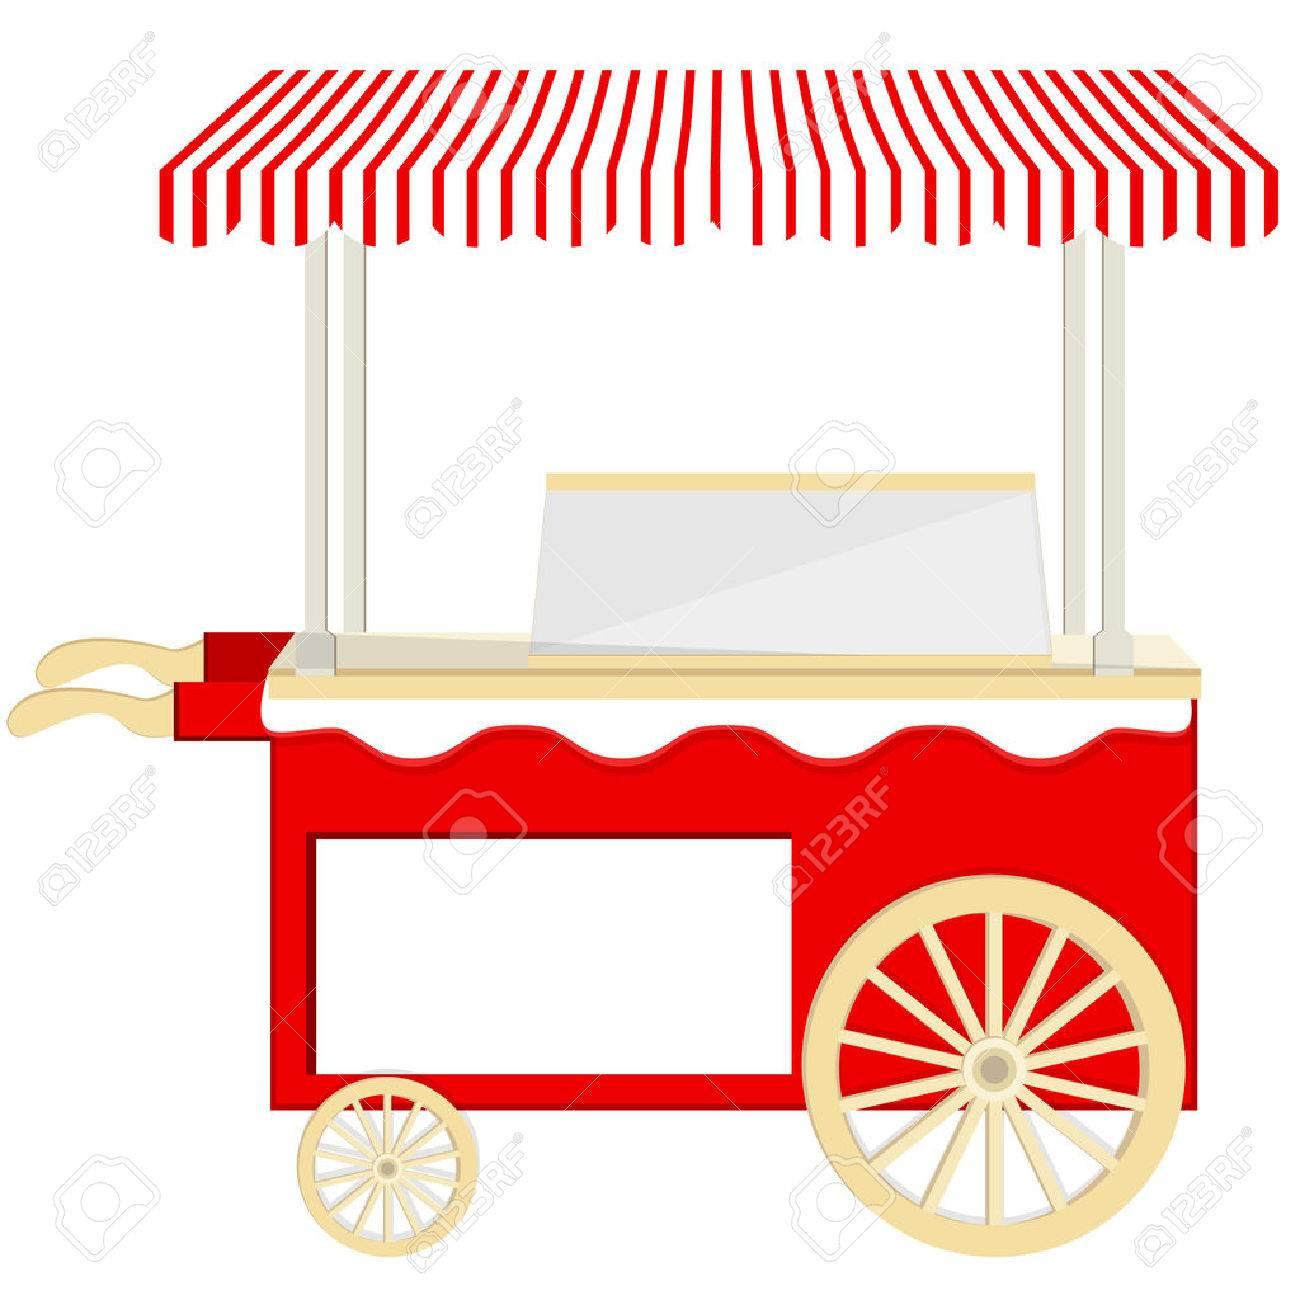 Ice cream red cart vector icon isolated, ice cream stand, ice...